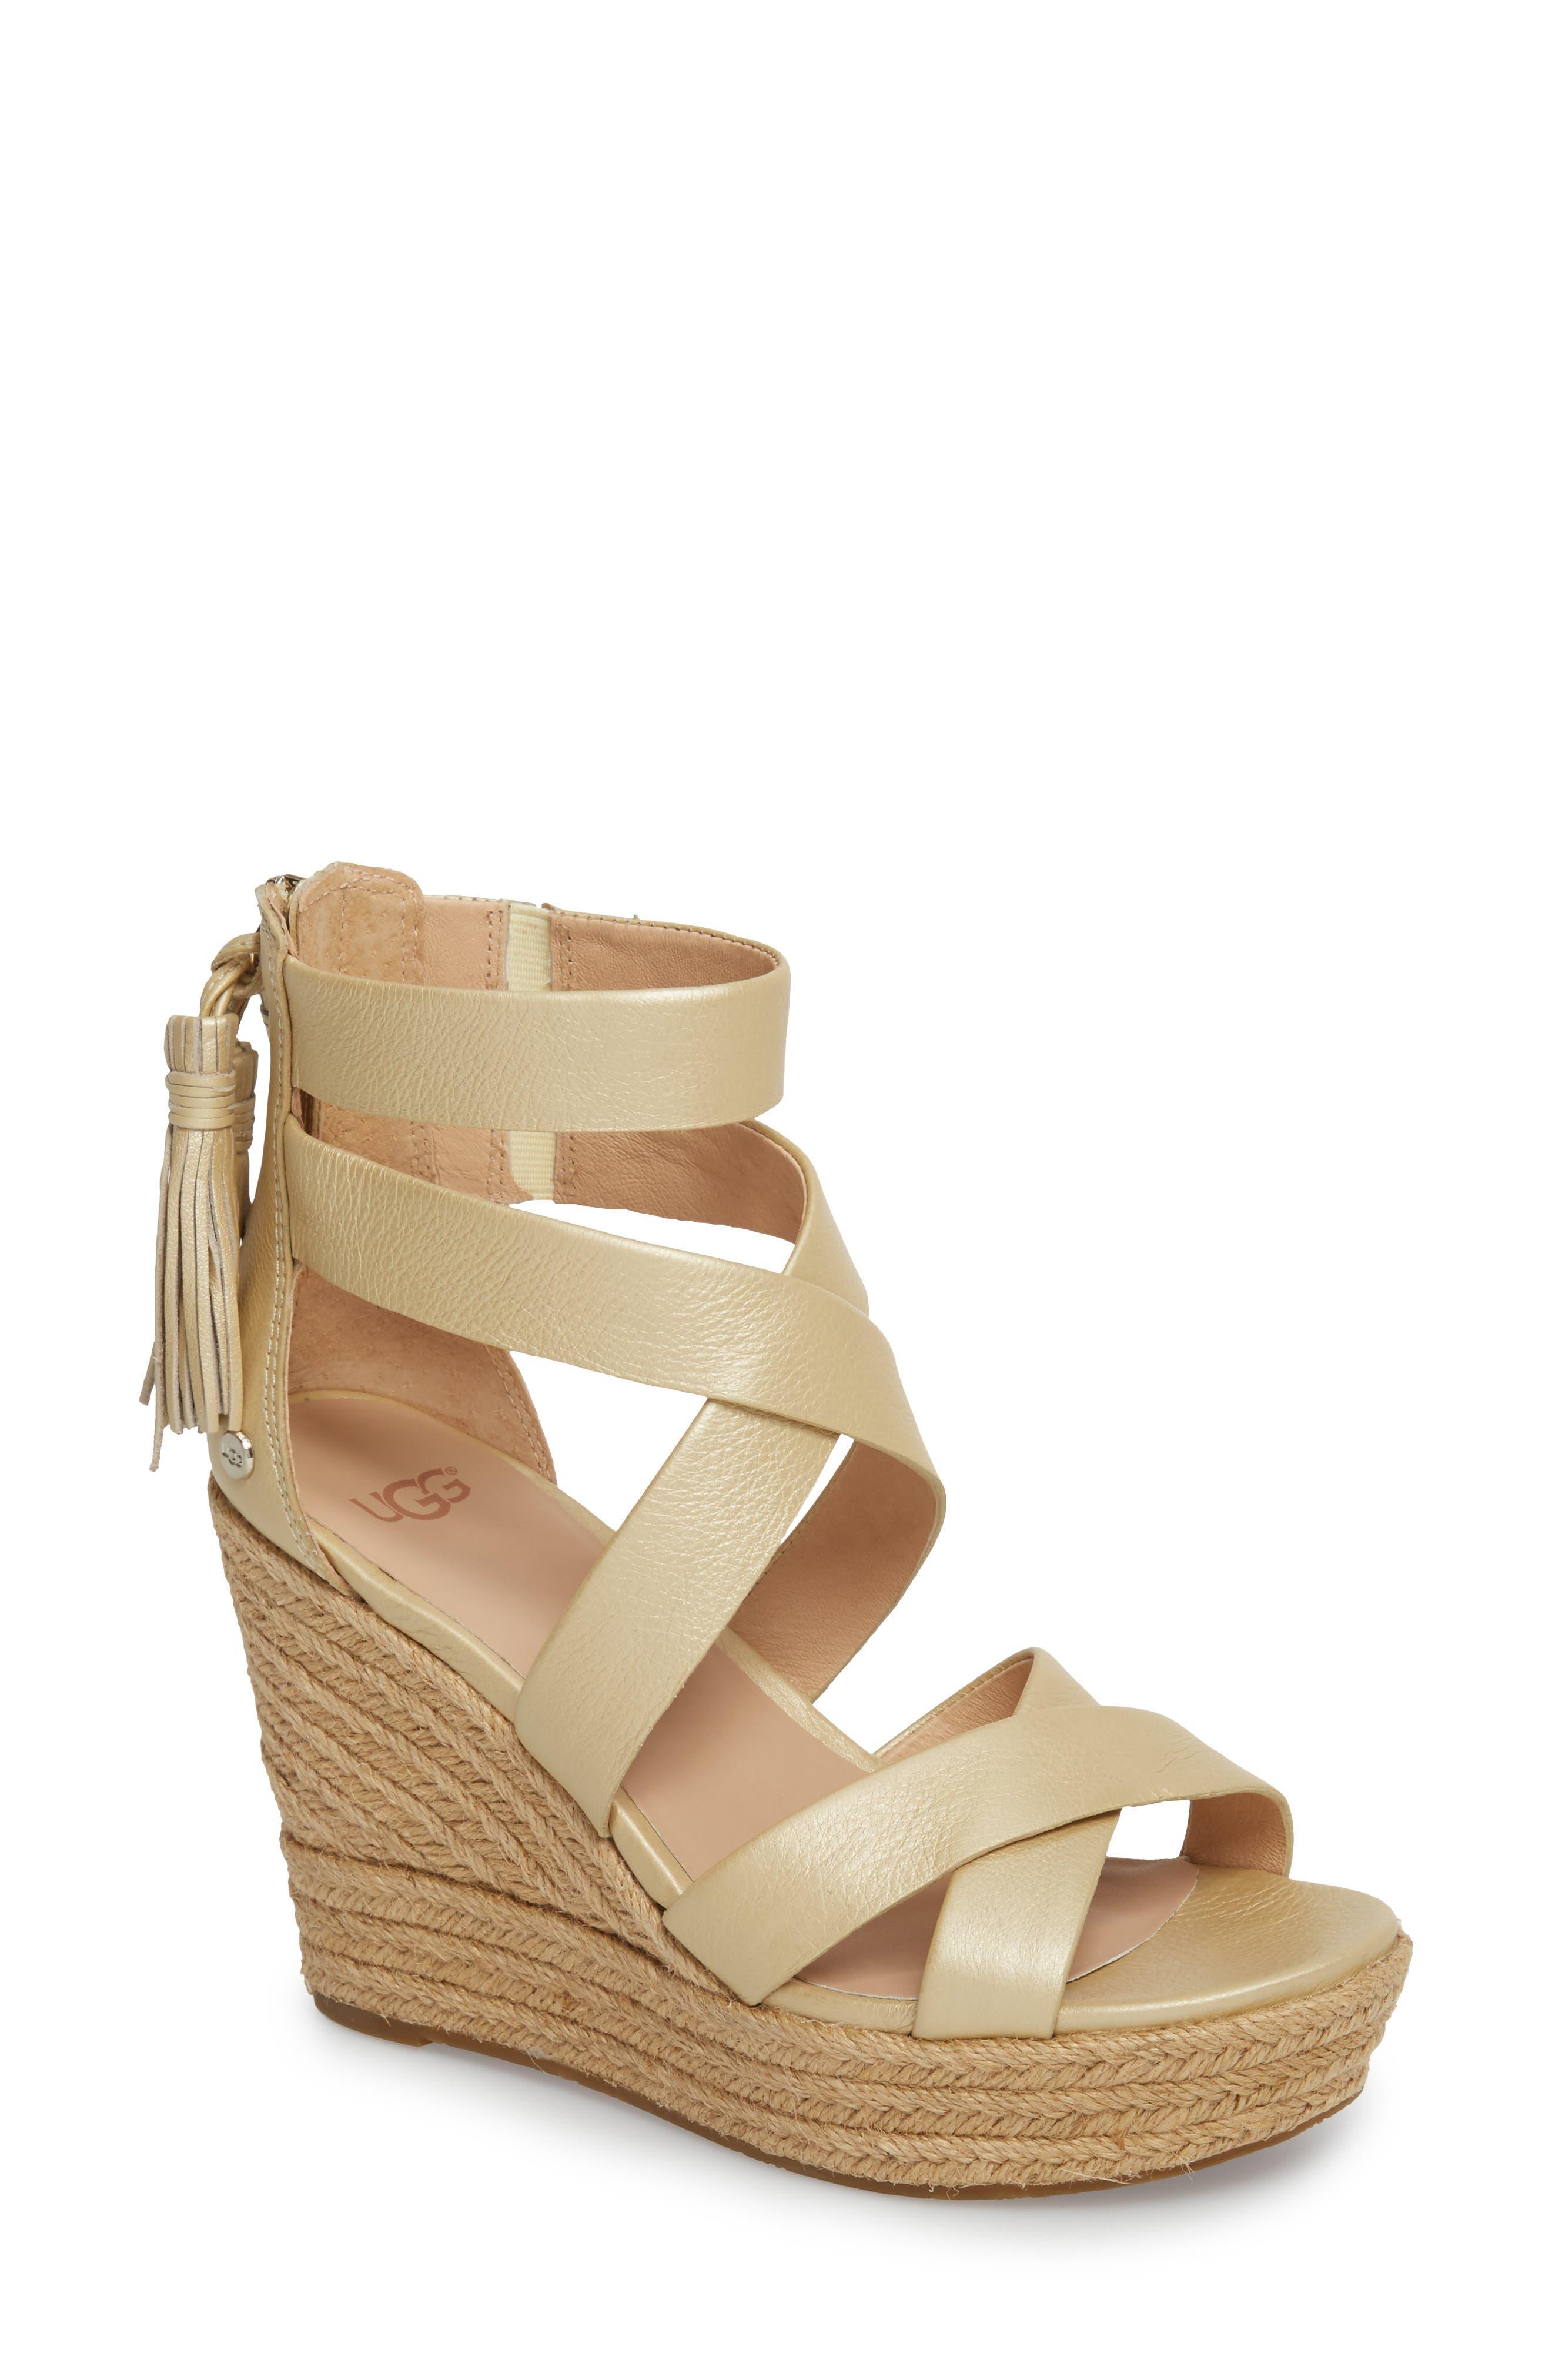 Ugg Raquel Platform Wedge Sandal, Metallic